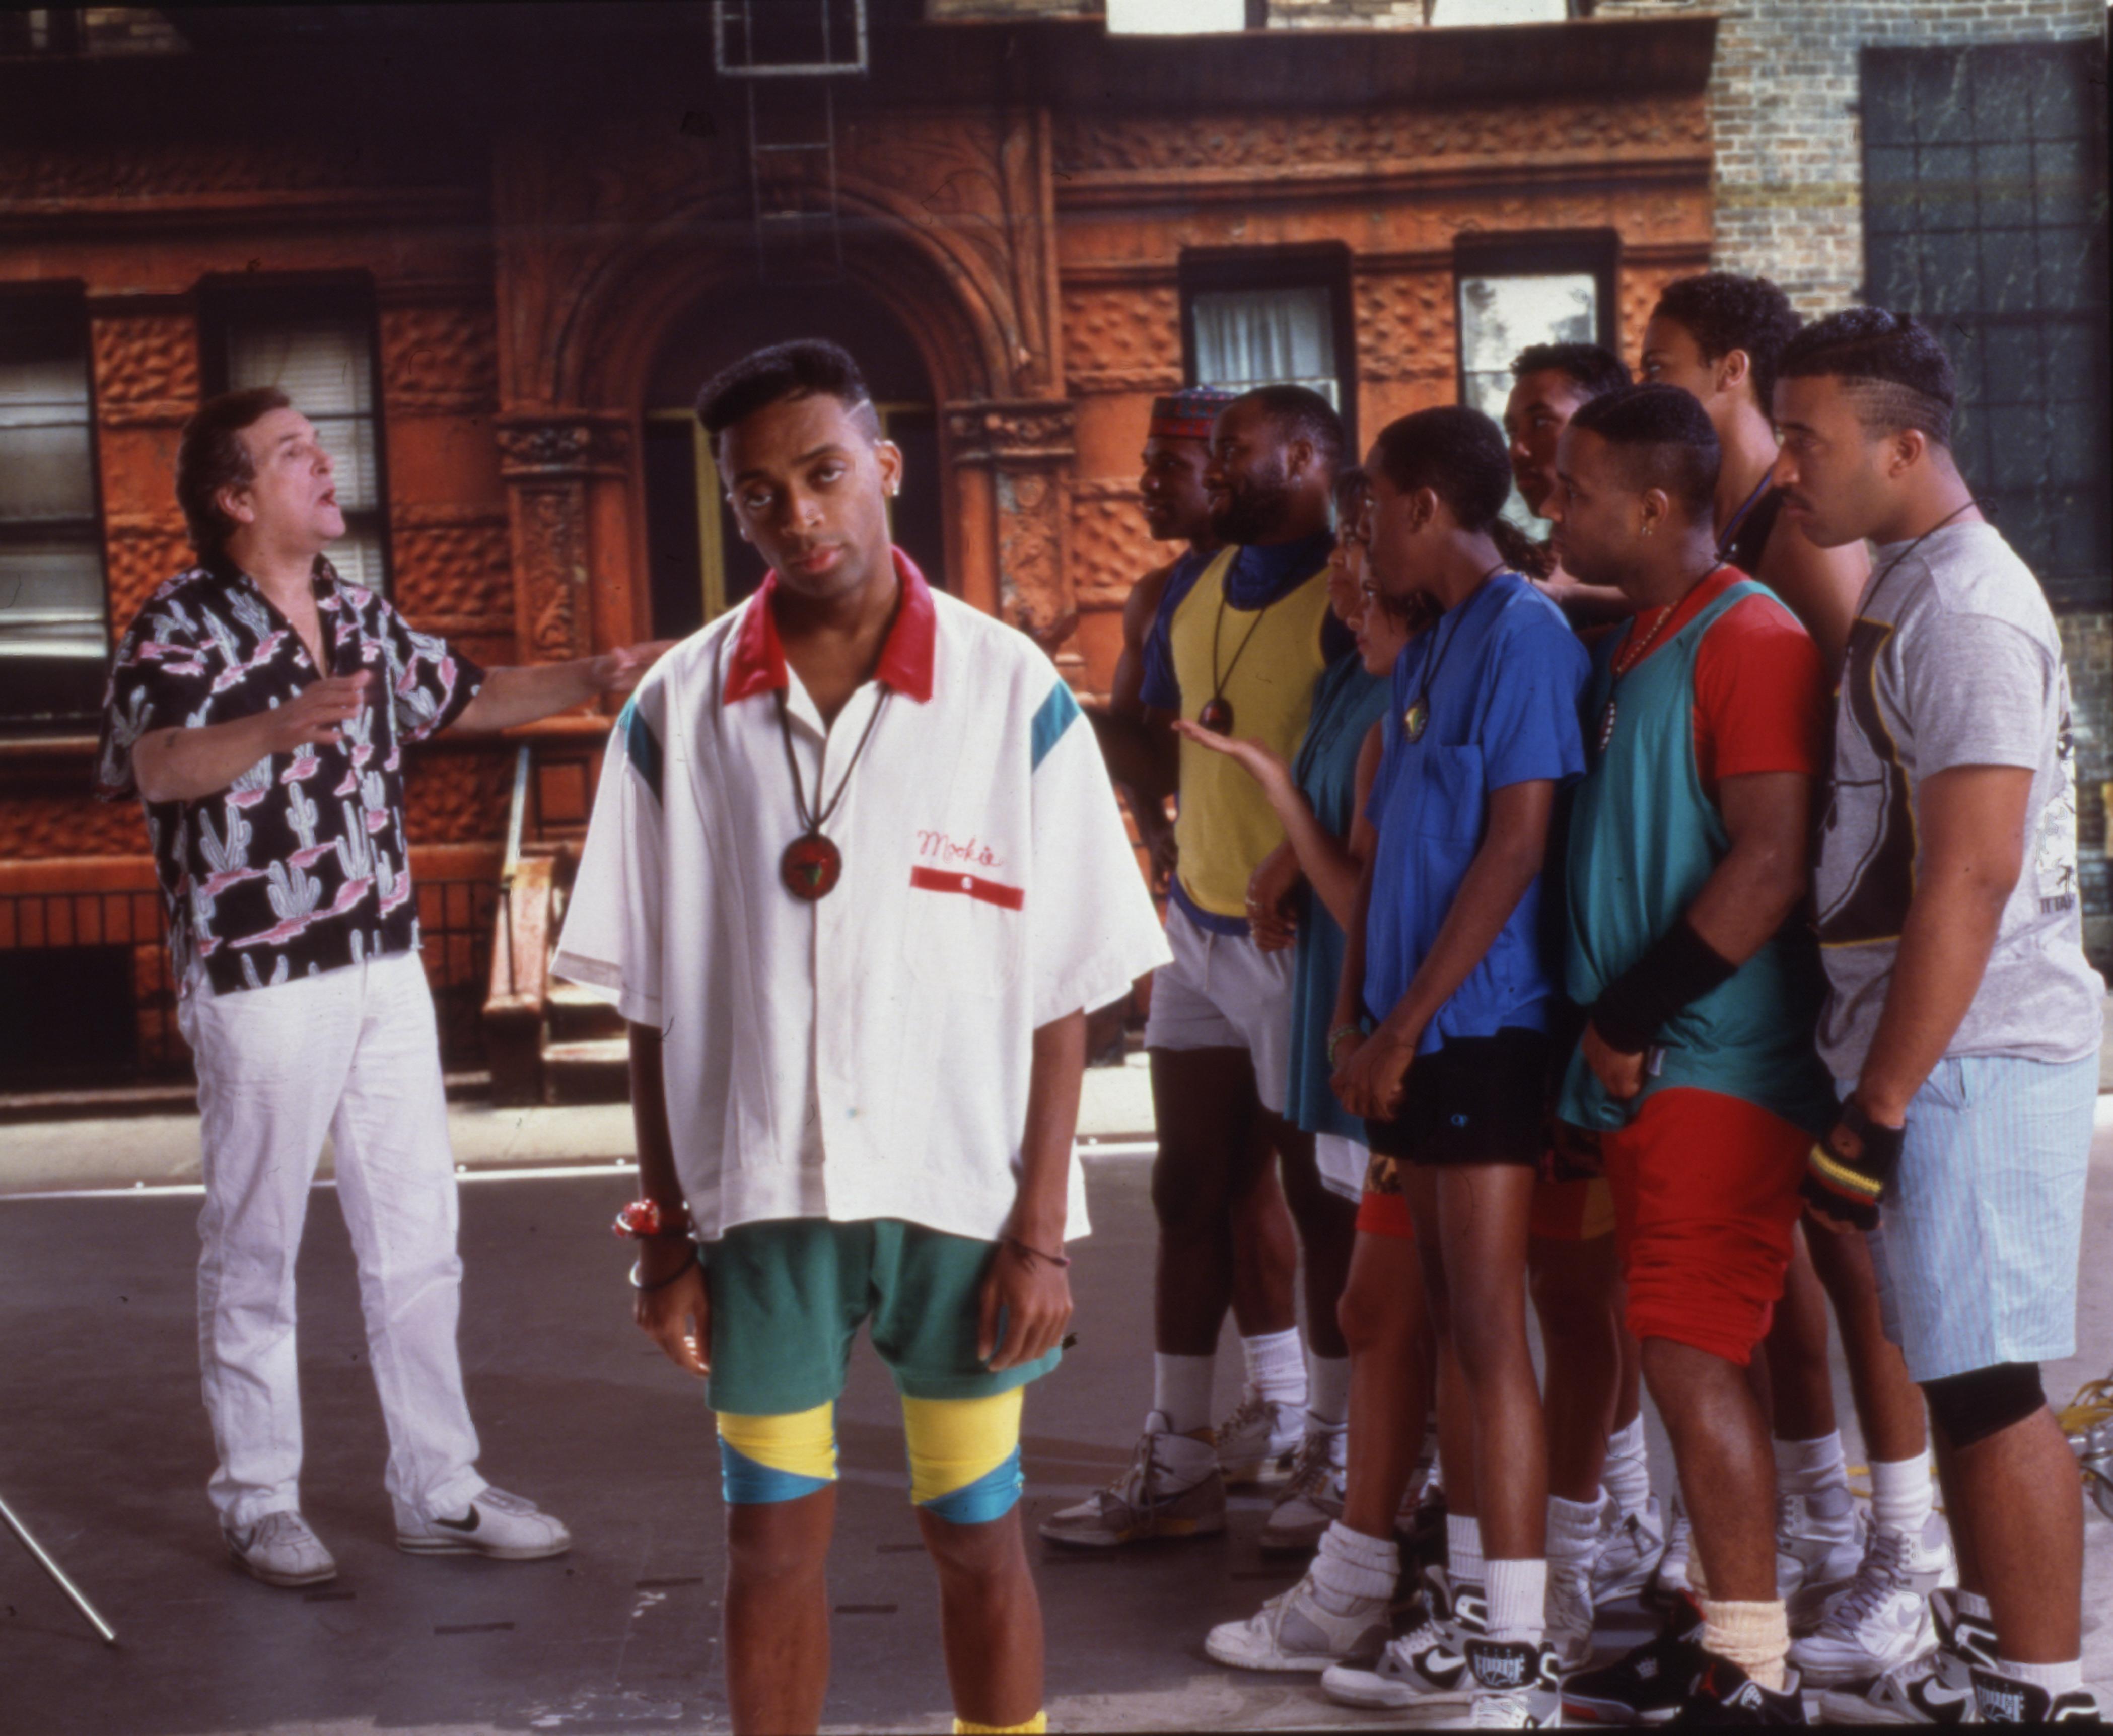 Full Summer Schedule Of LA's Outdoor Movie Screenings Featuring Black Leads